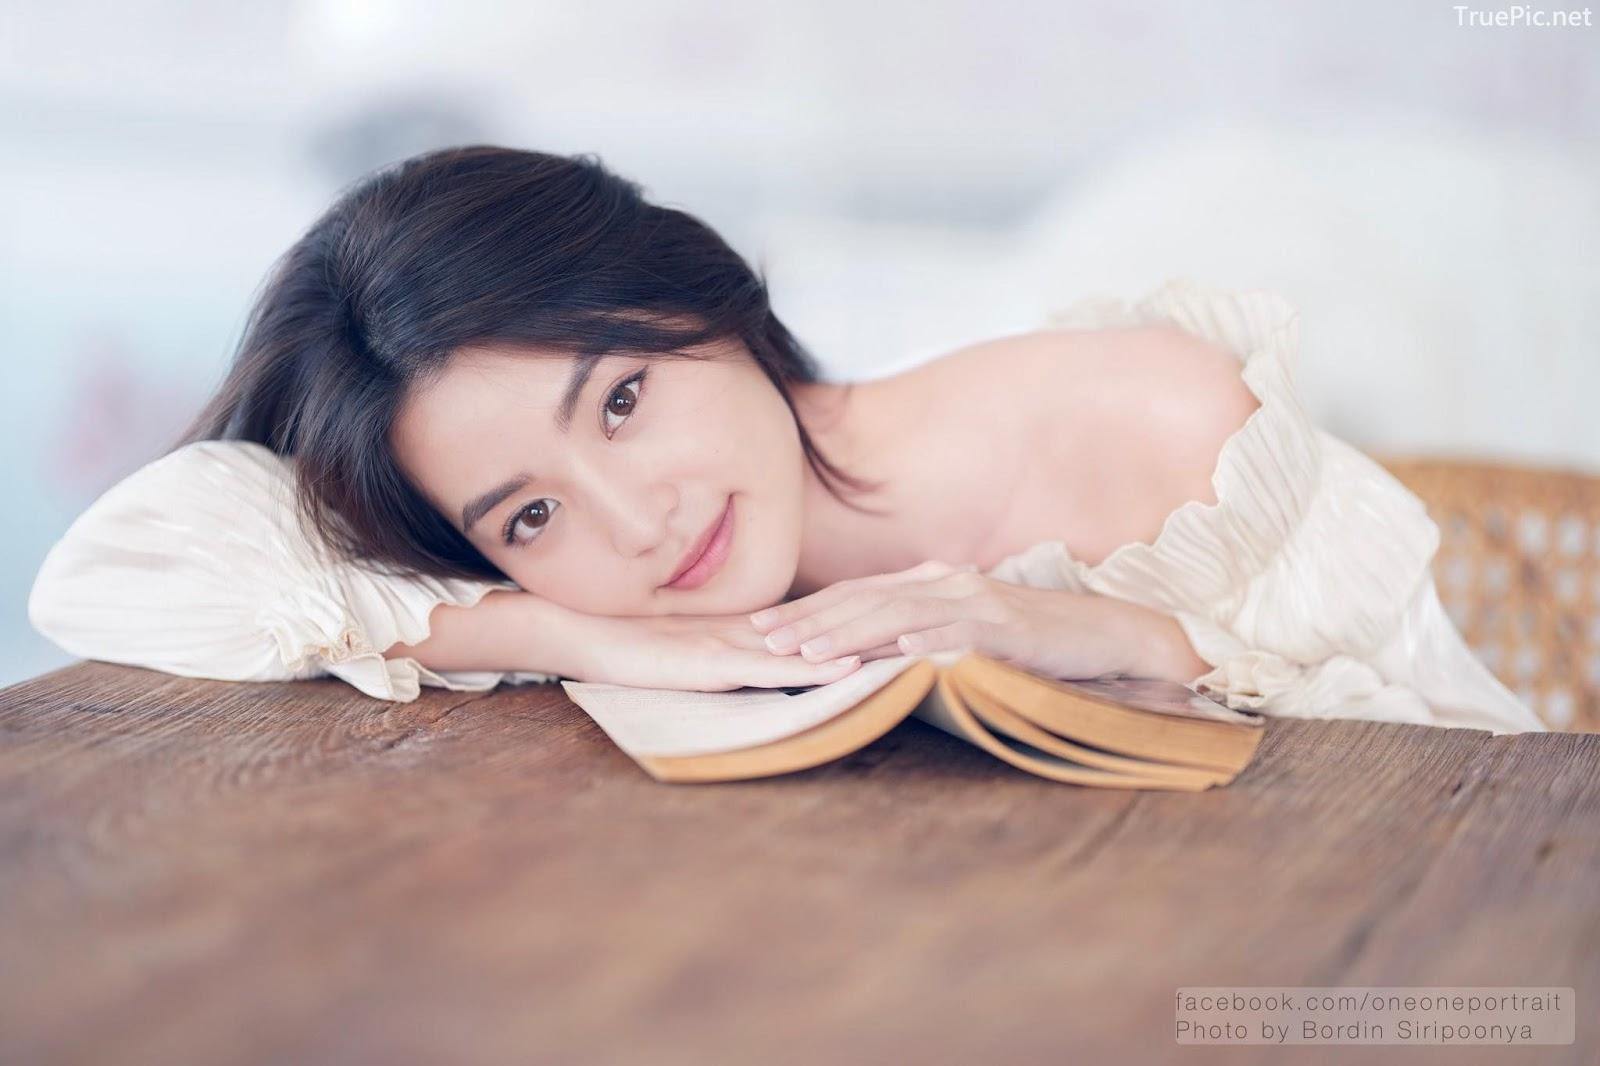 Beauty Thailand Kapook Phatchara vs Photo album Love you 3000 - Picture 7